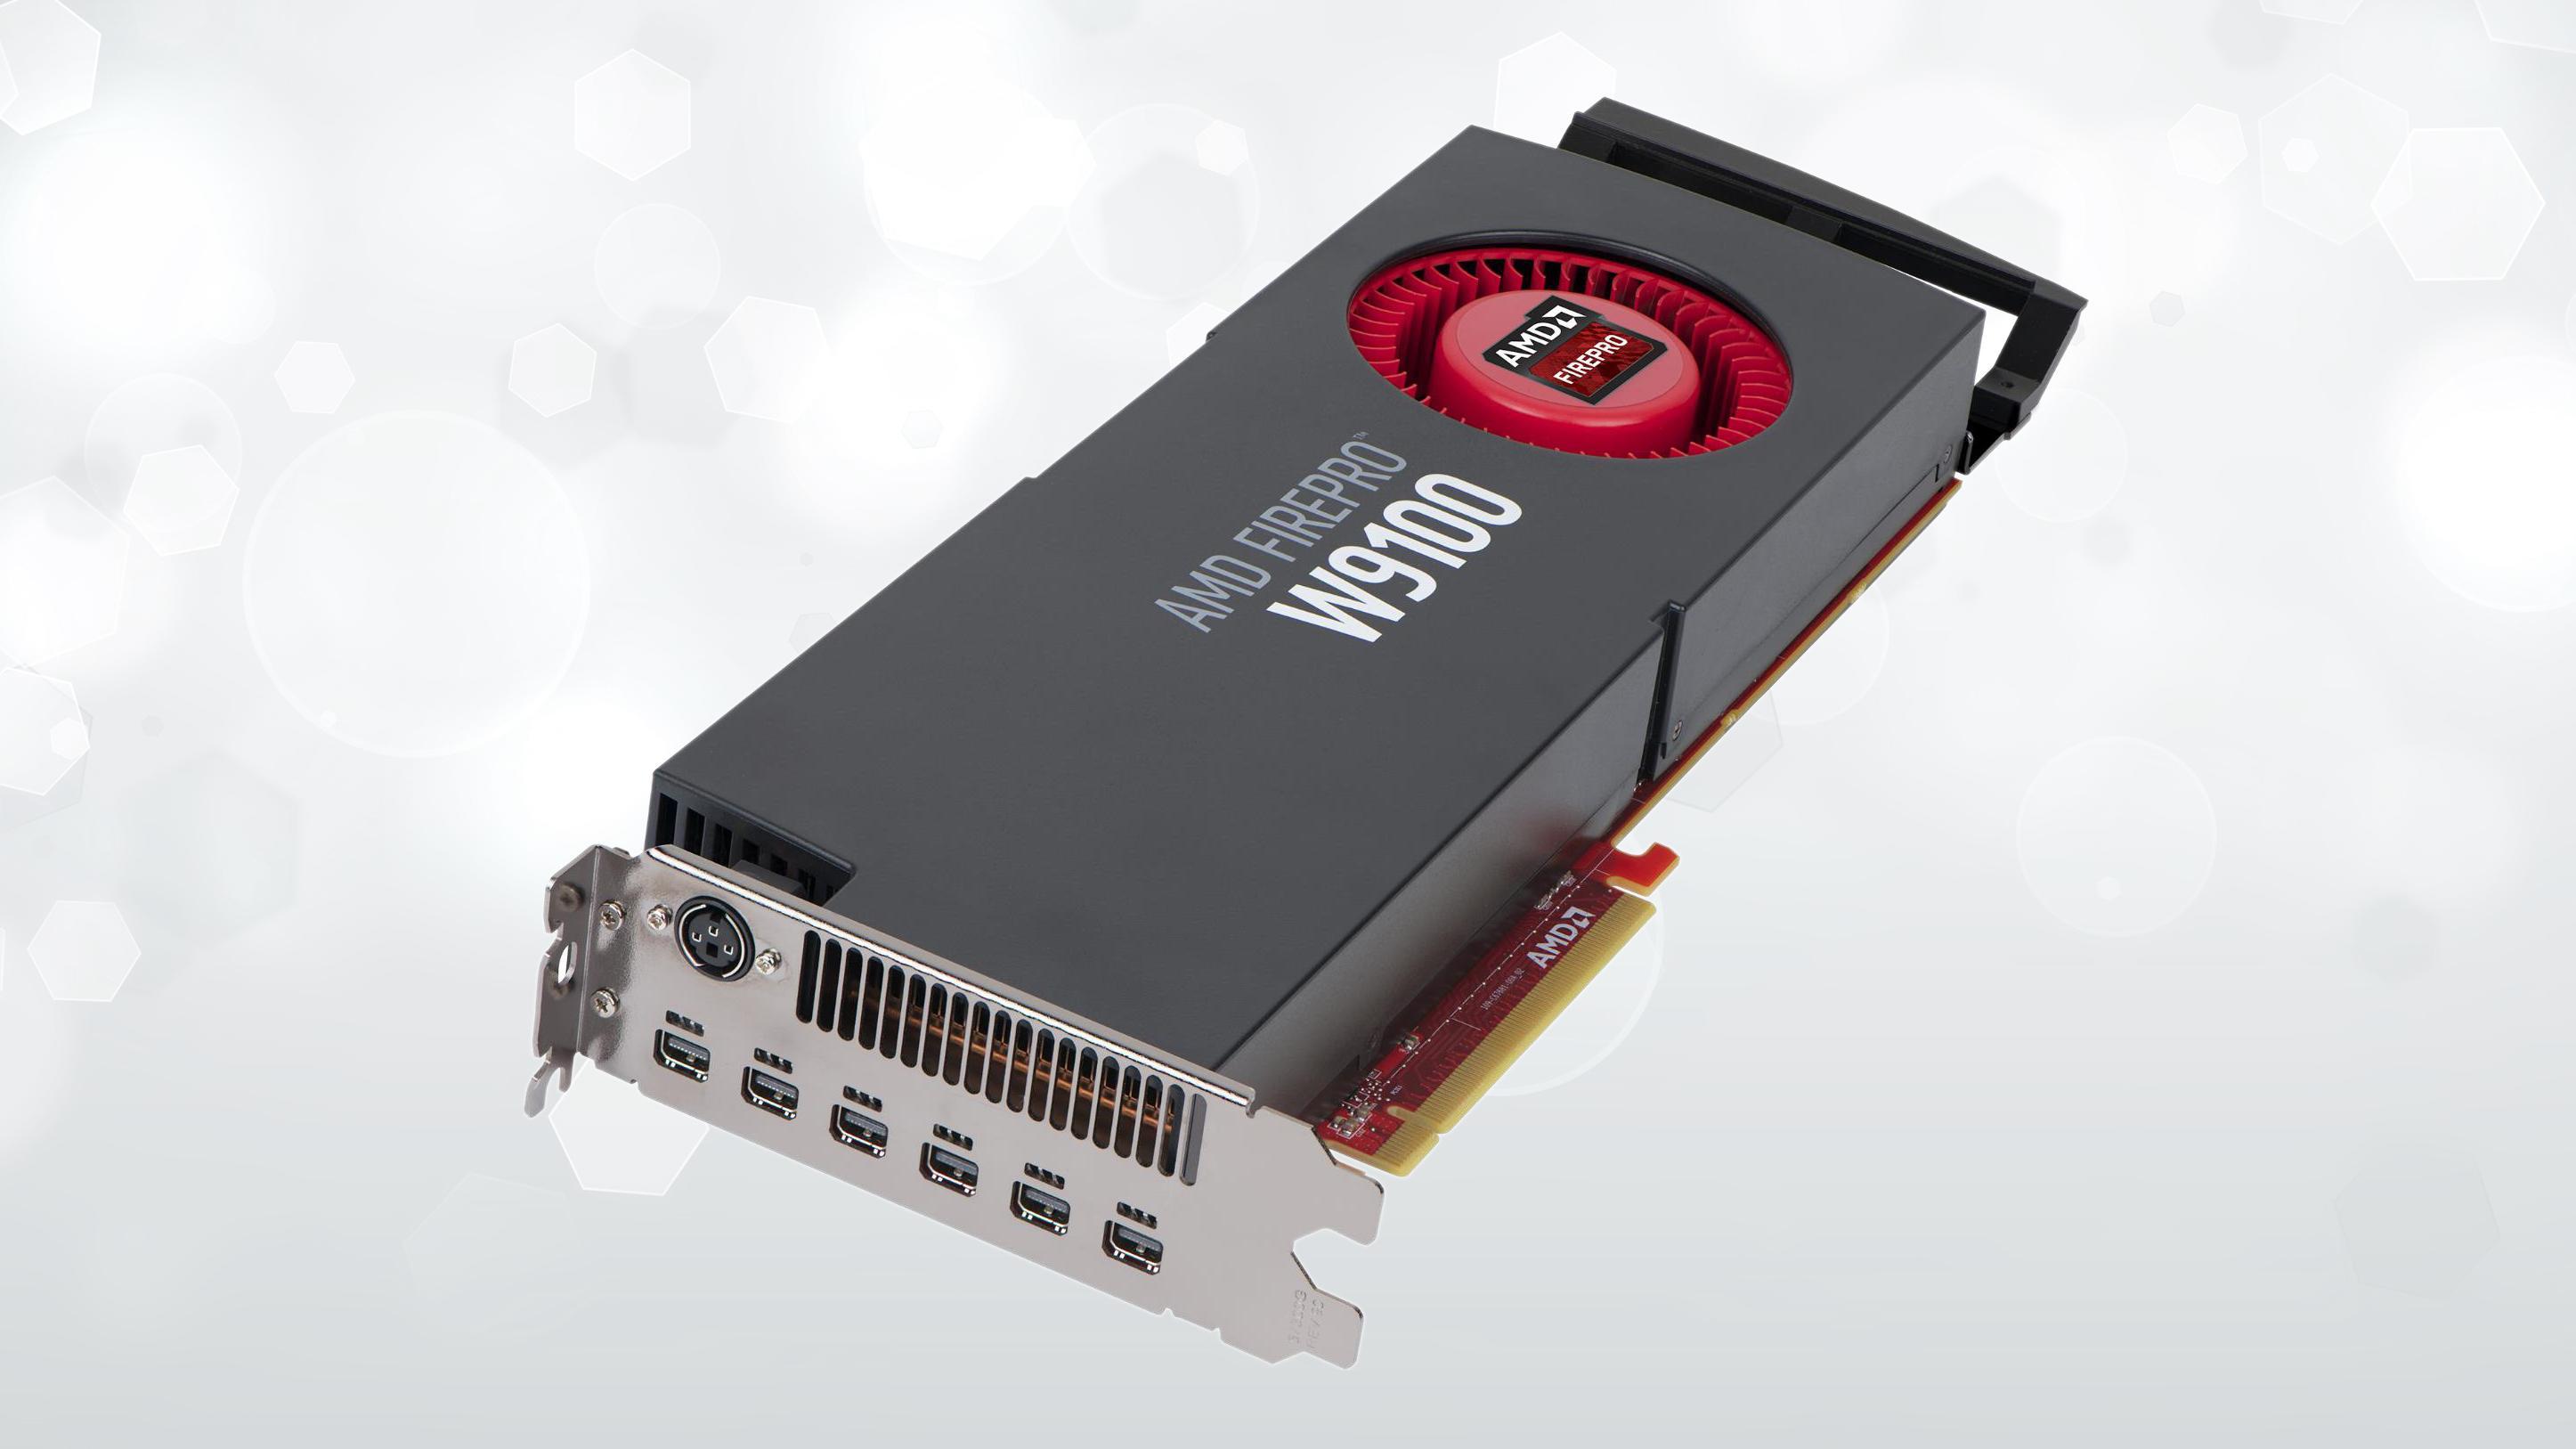 AMDs nye proff-skjermkort har 32 GB minne